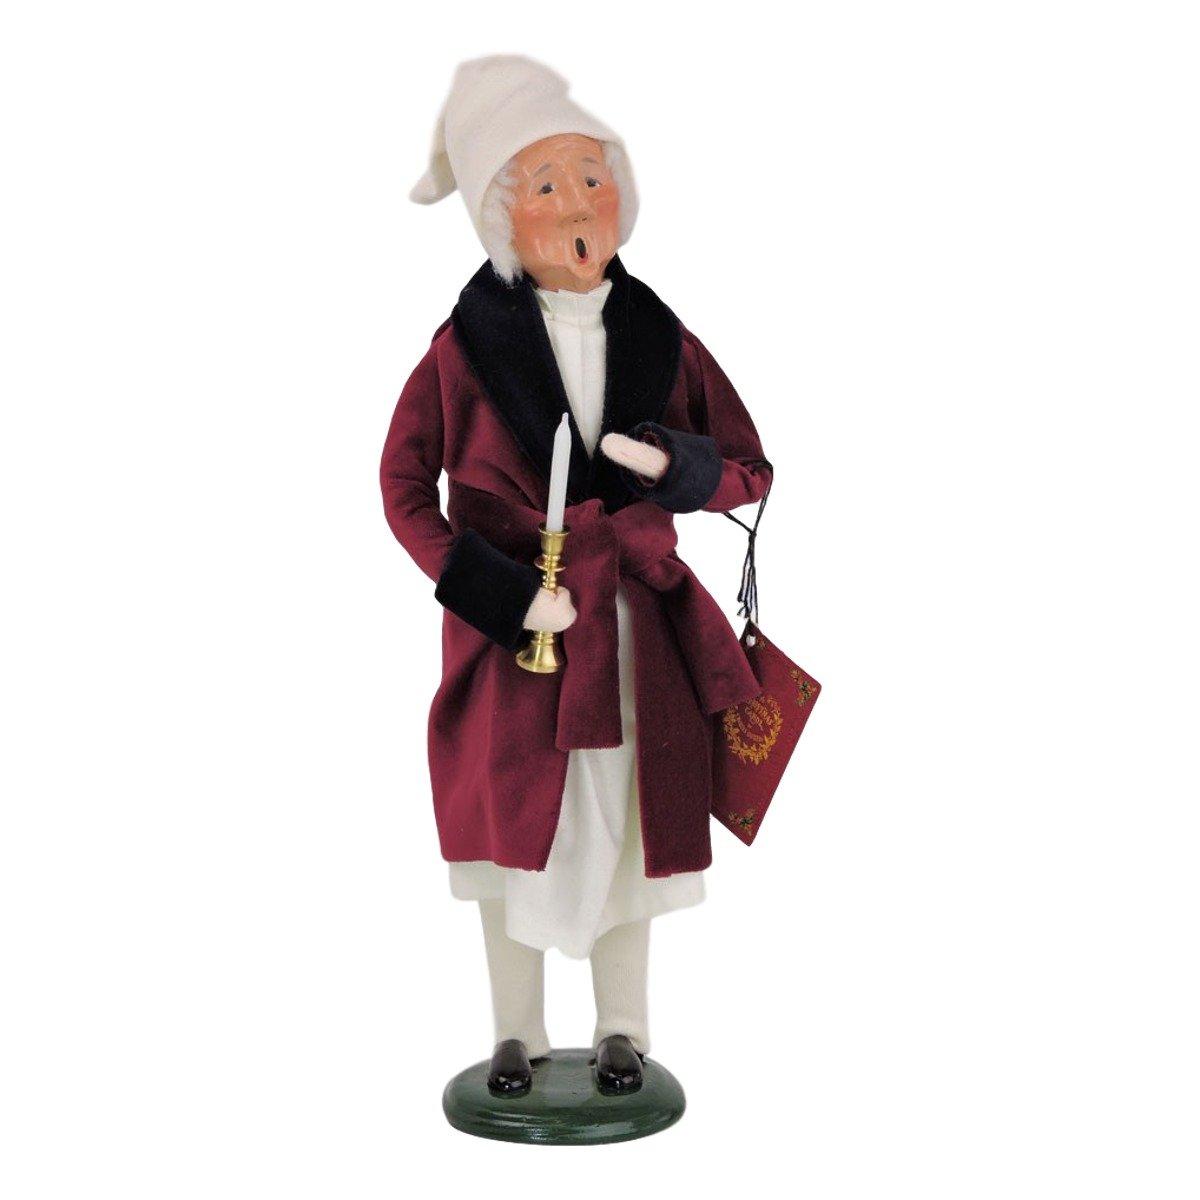 Christmas carolers figurines for sale - Amazon Com Byers Choice Caroler Scrooge Christmas Figurine 201 Home Kitchen